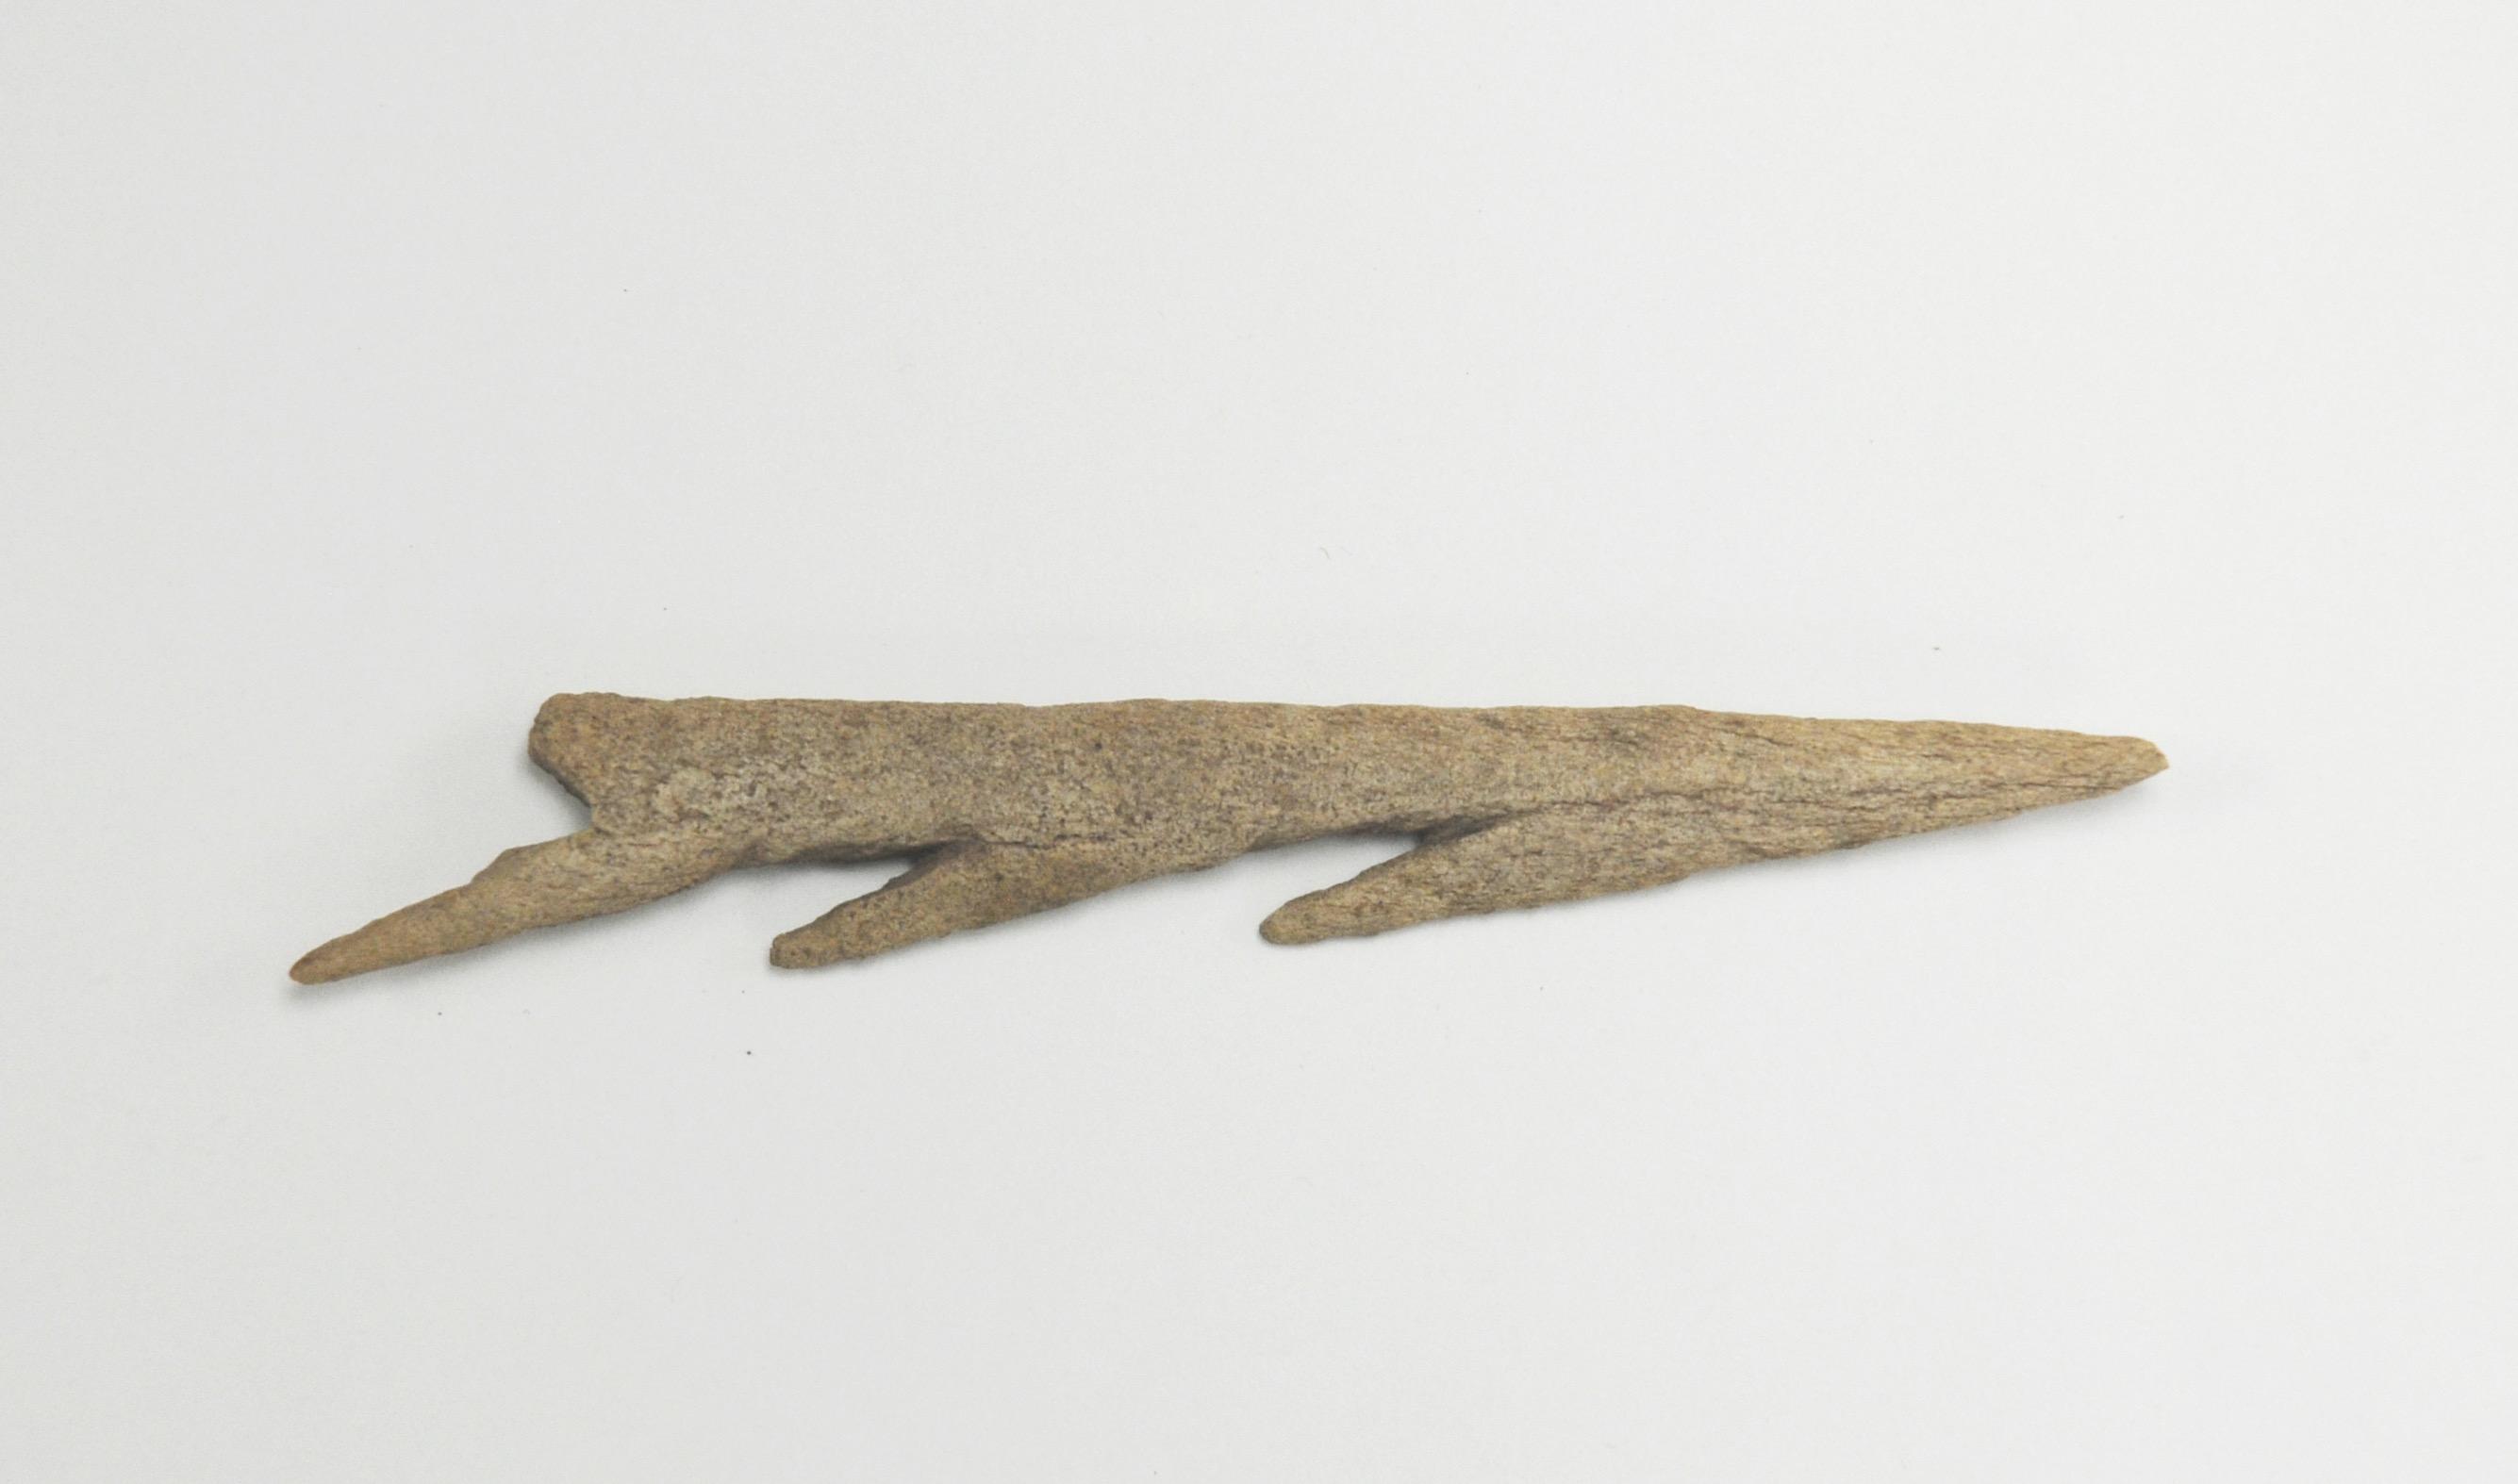 Fish spear